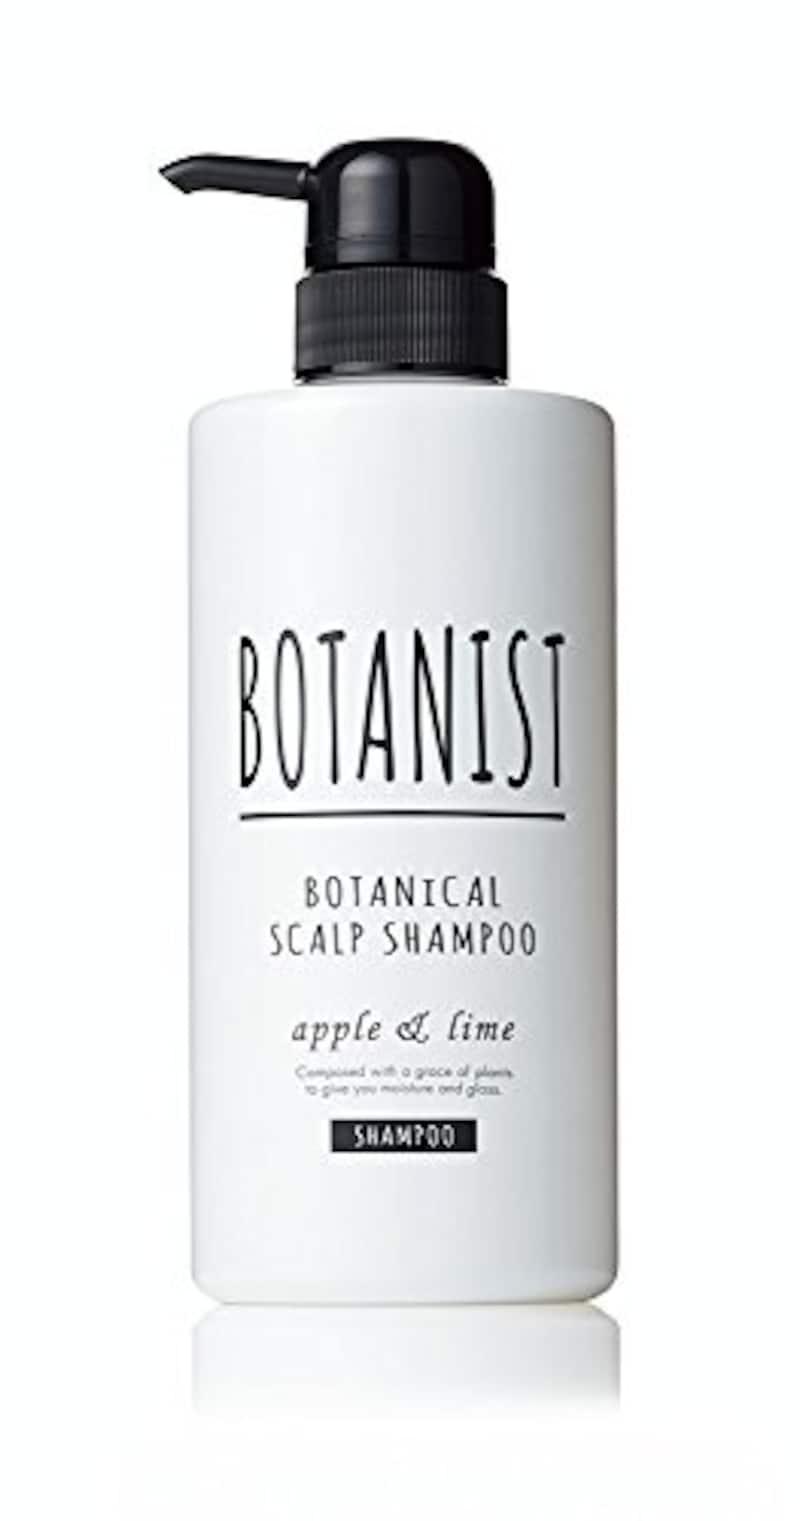 BOTANIST(ボタニスト),ボタニカルスカルプシャンプー